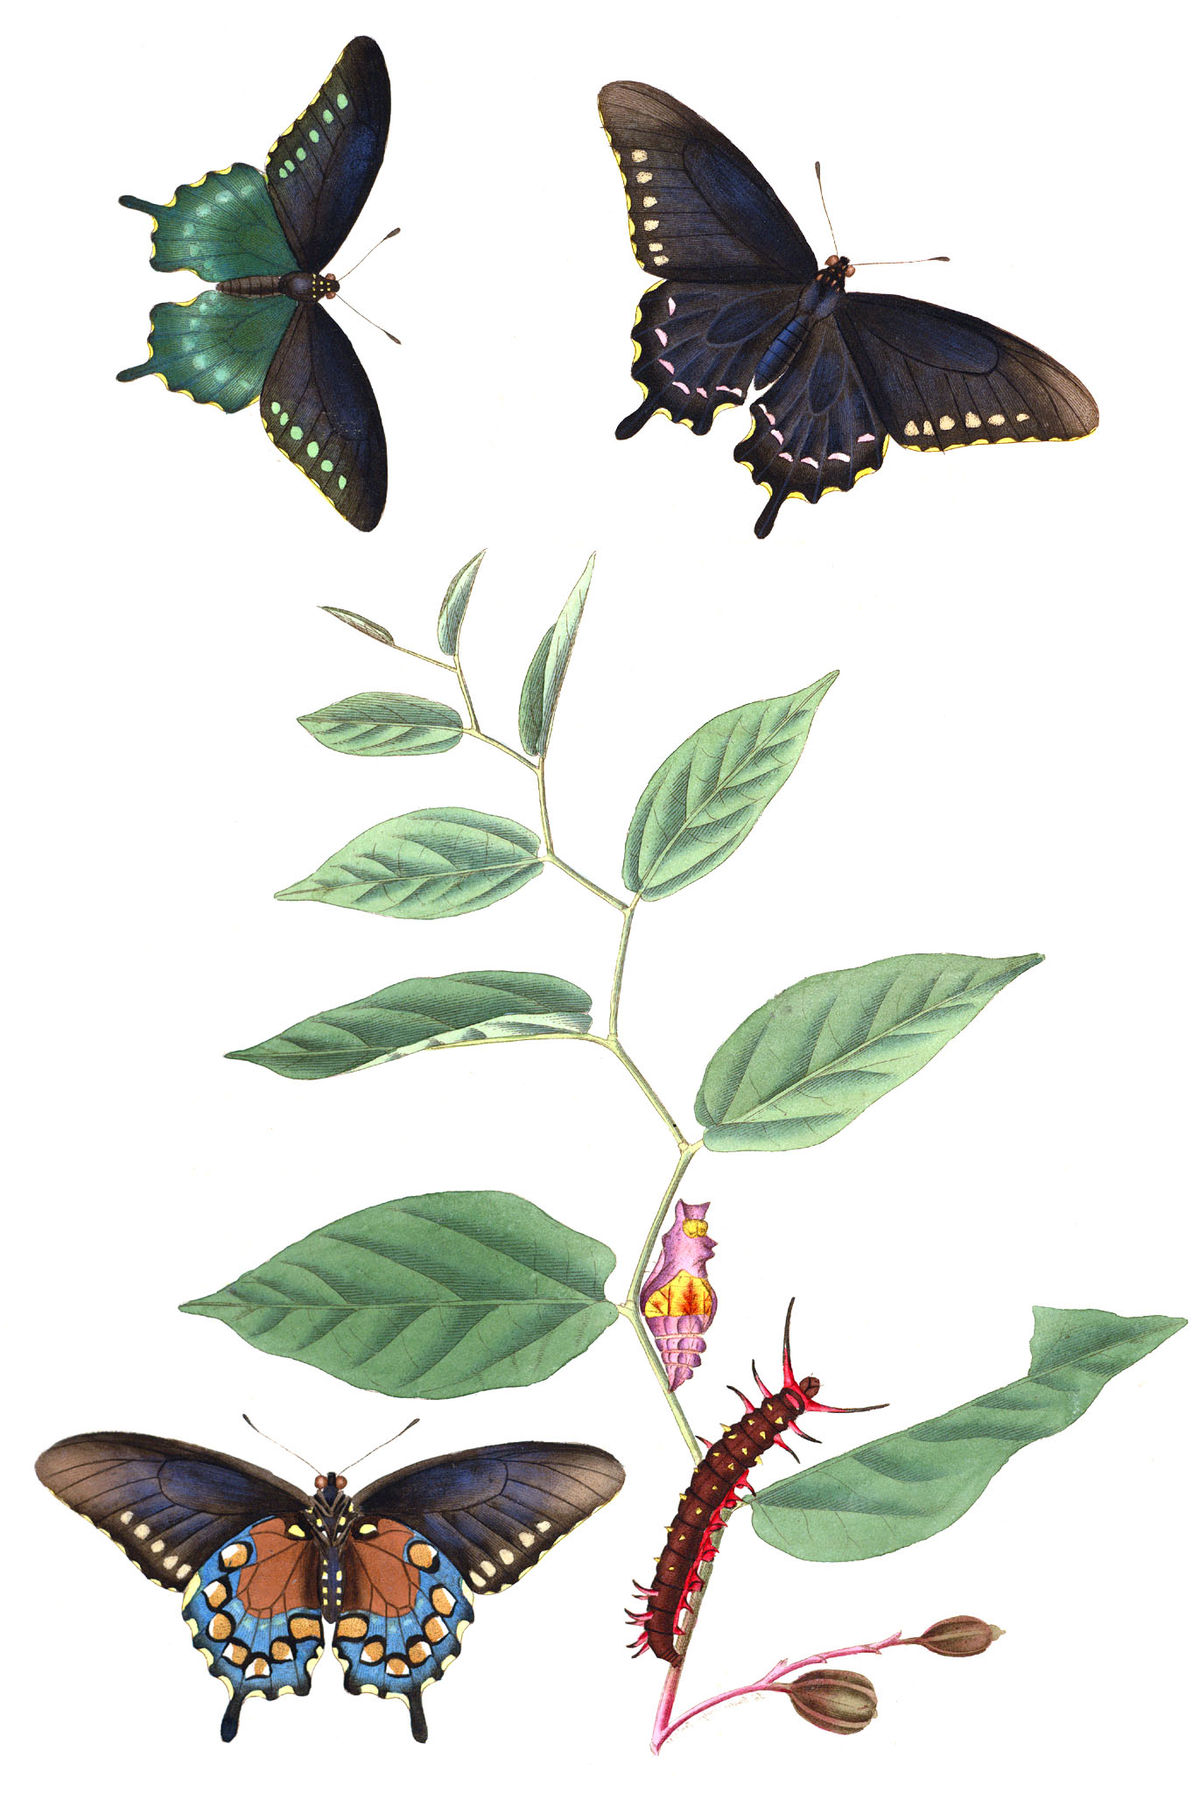 aristolochia serpentaria